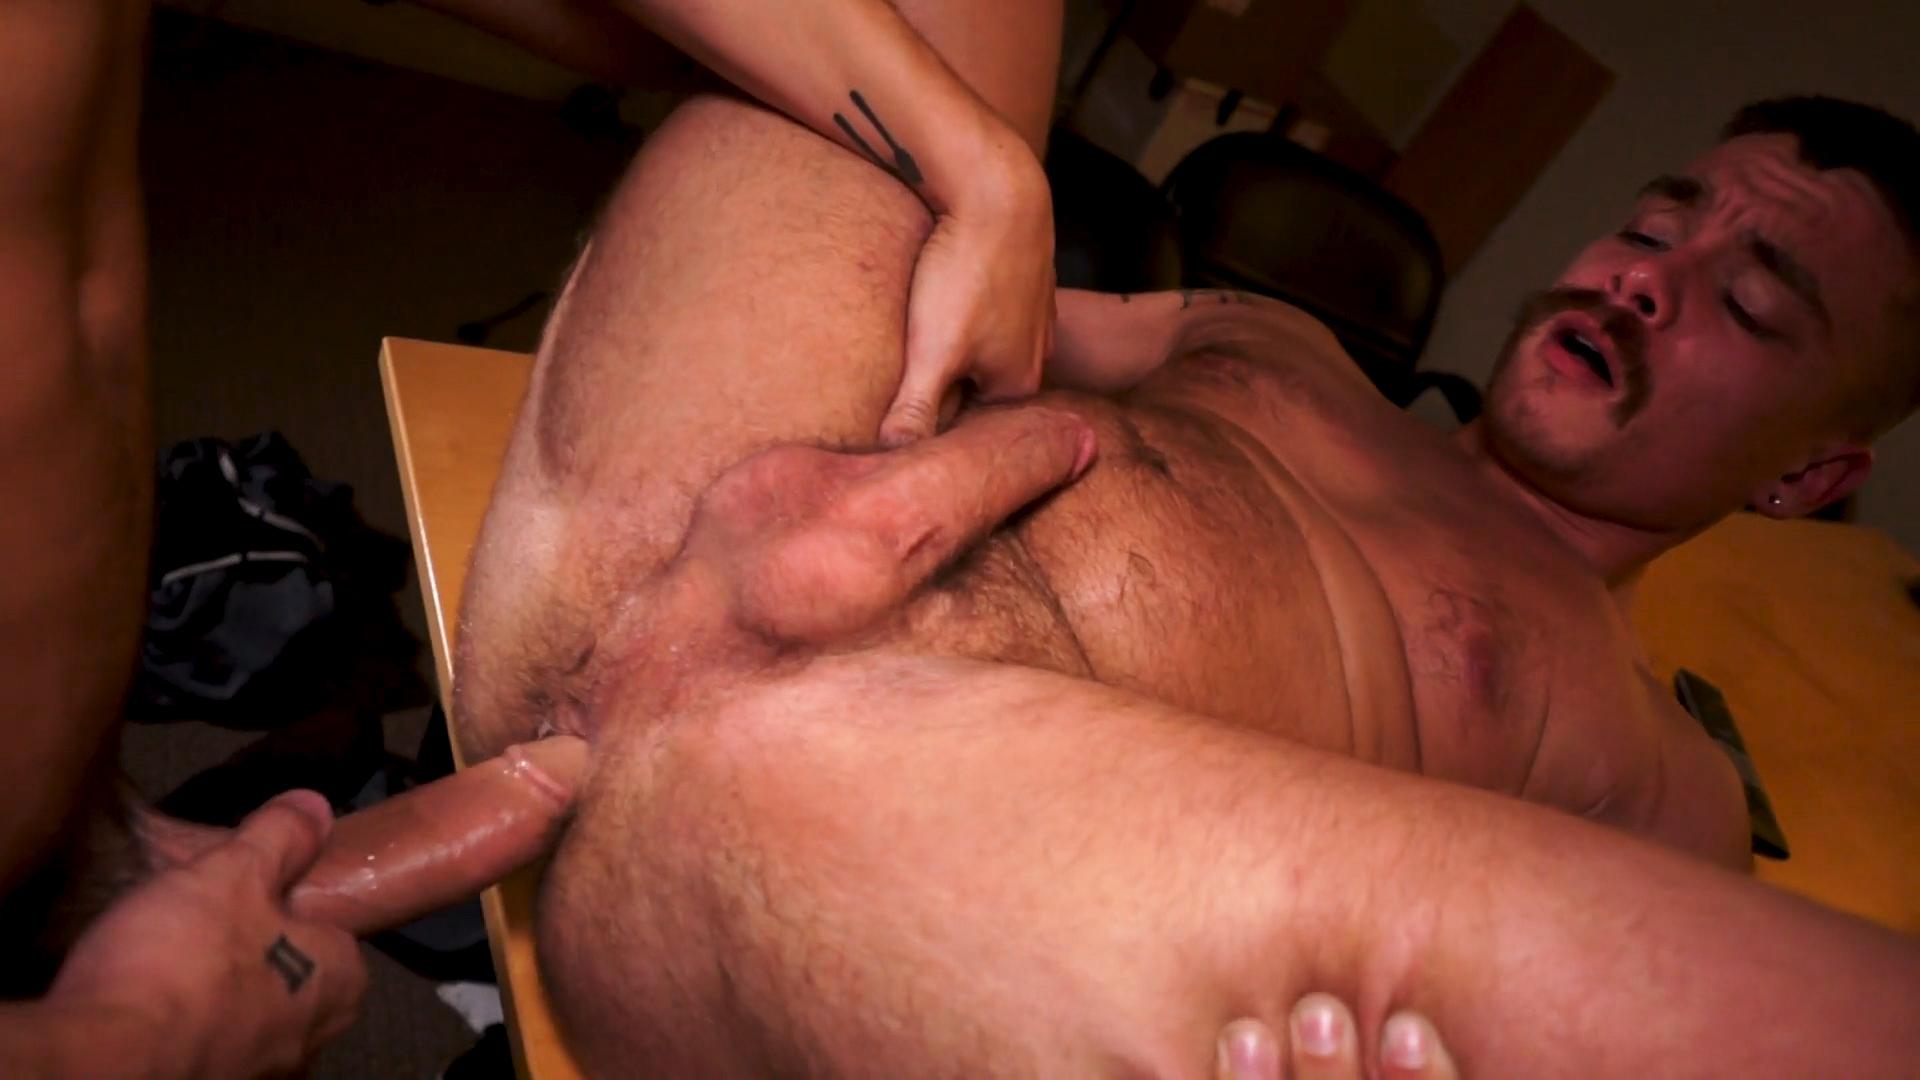 Actor Porno Gay Red aiden ward & matt roudy - gay - scene 4 from kenny's raw fucks